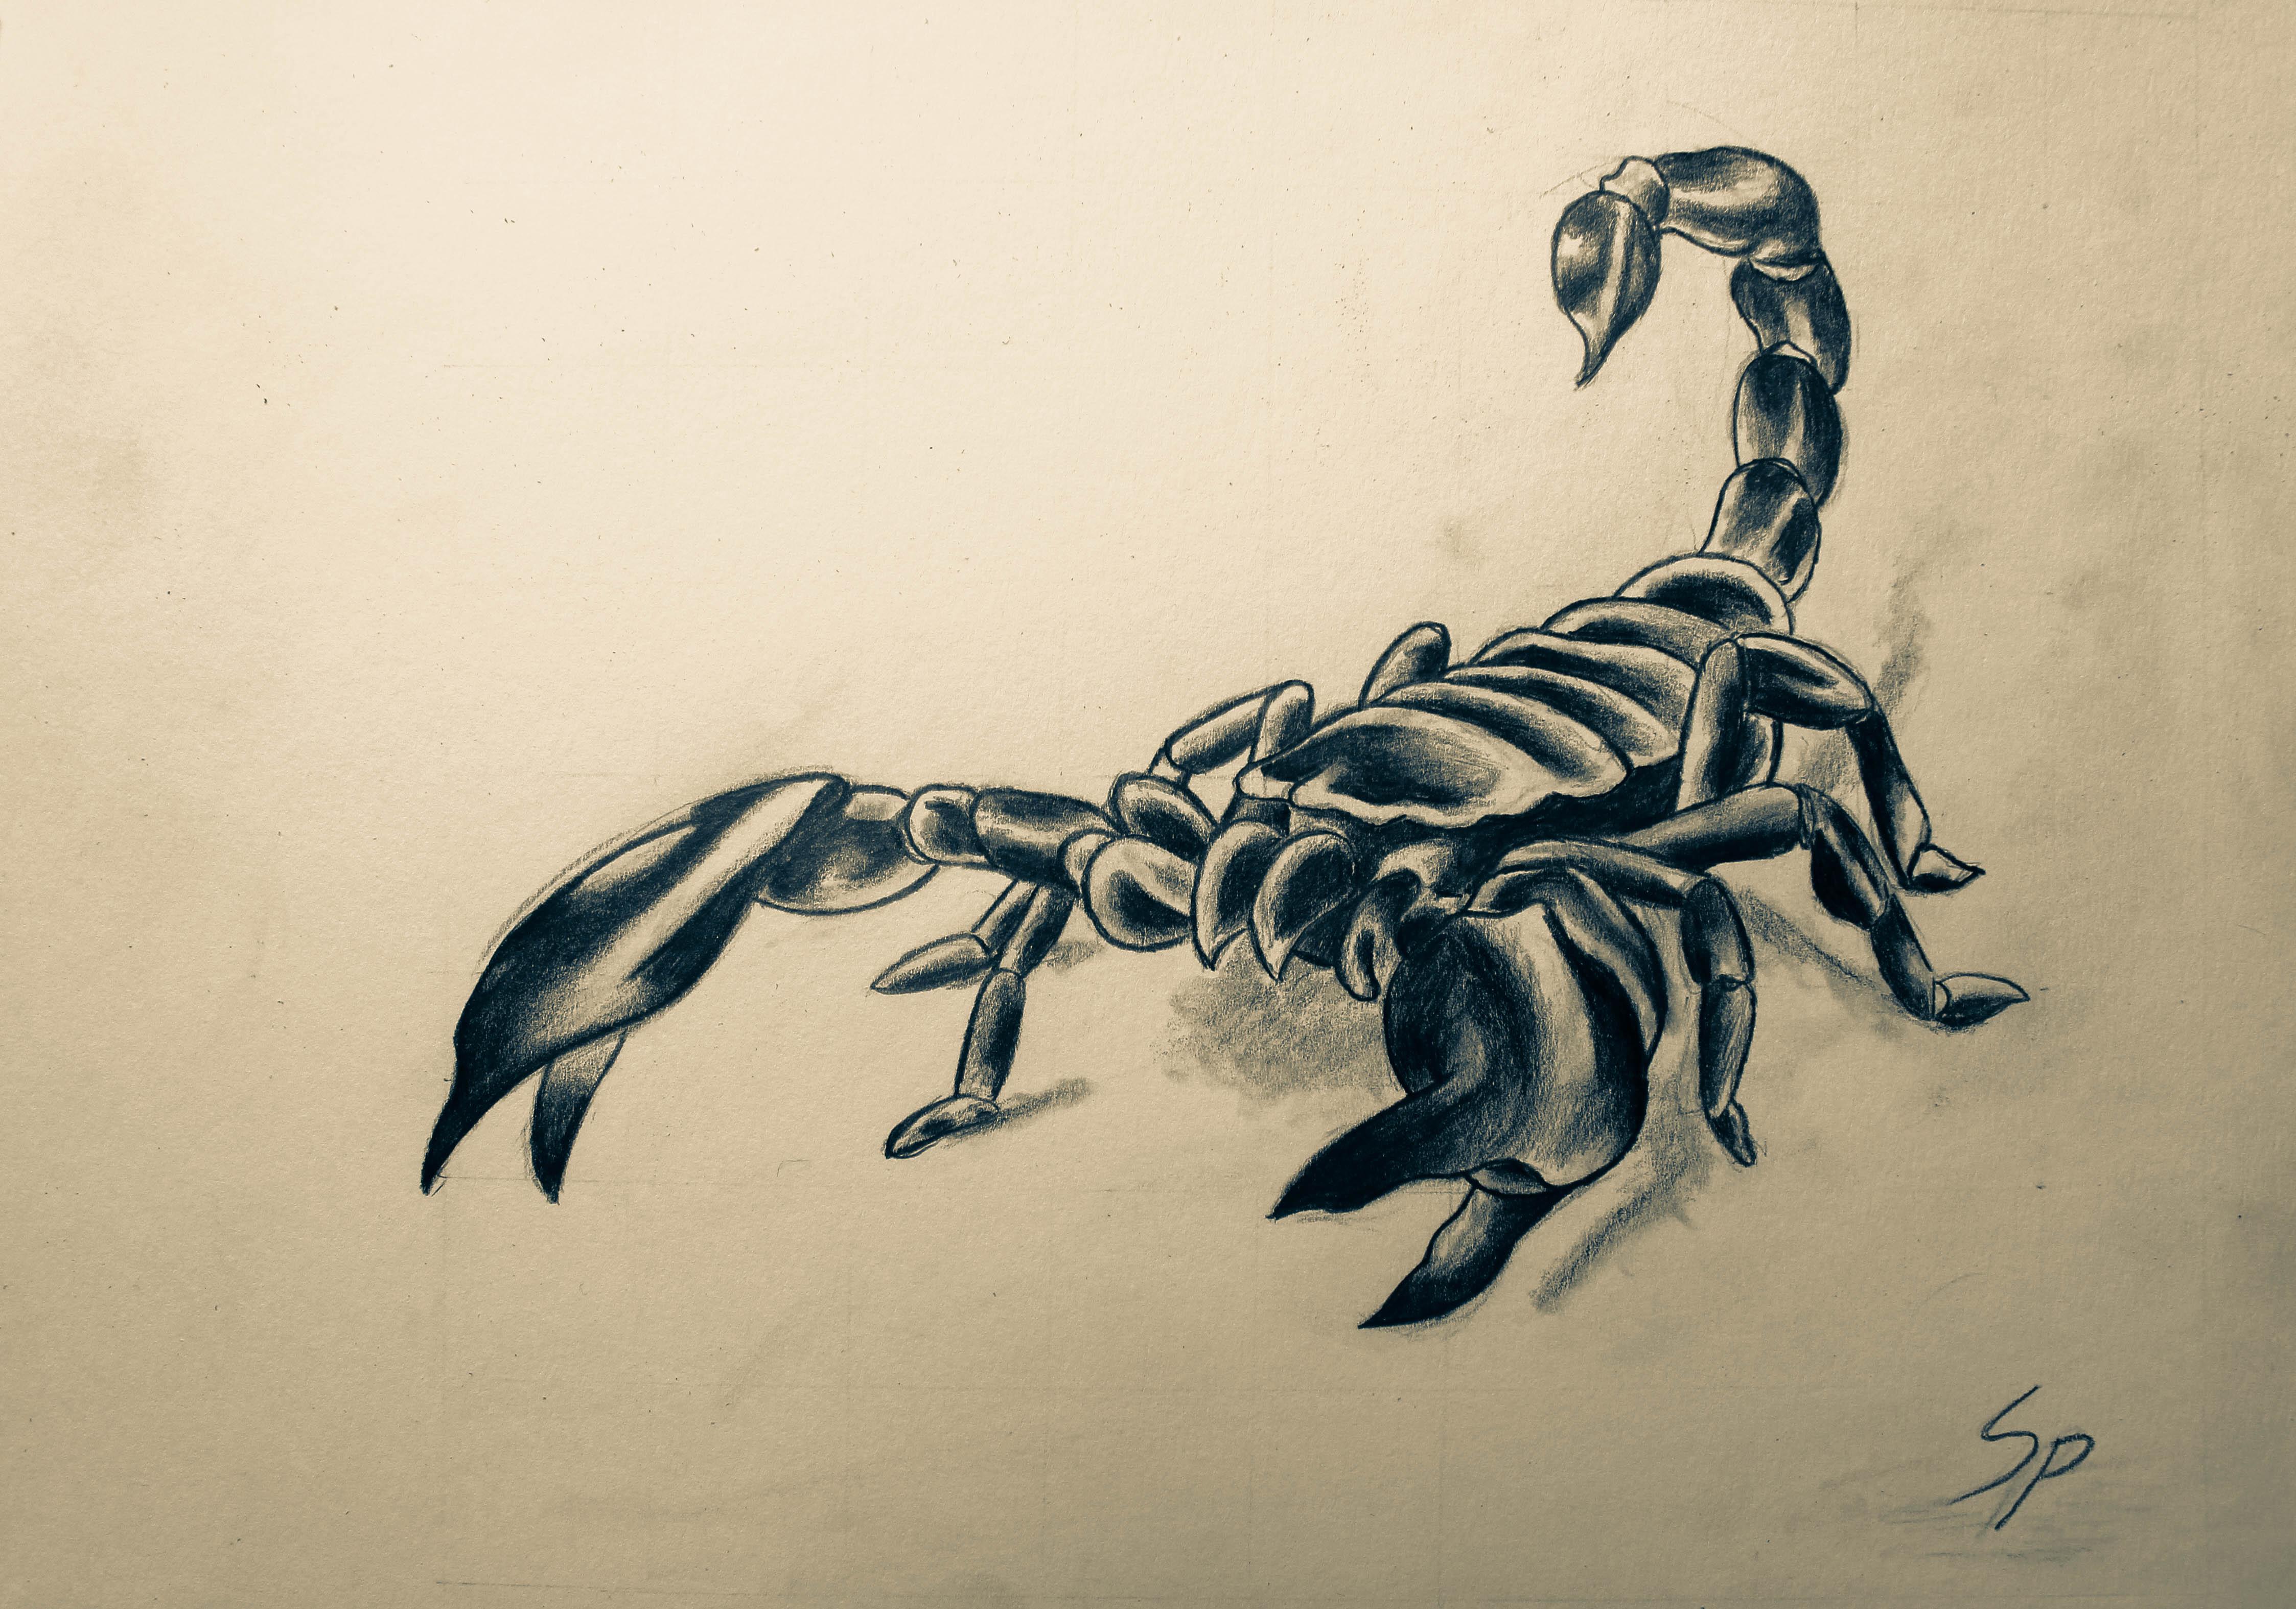 Traditional Scorpion Tattoo Designs